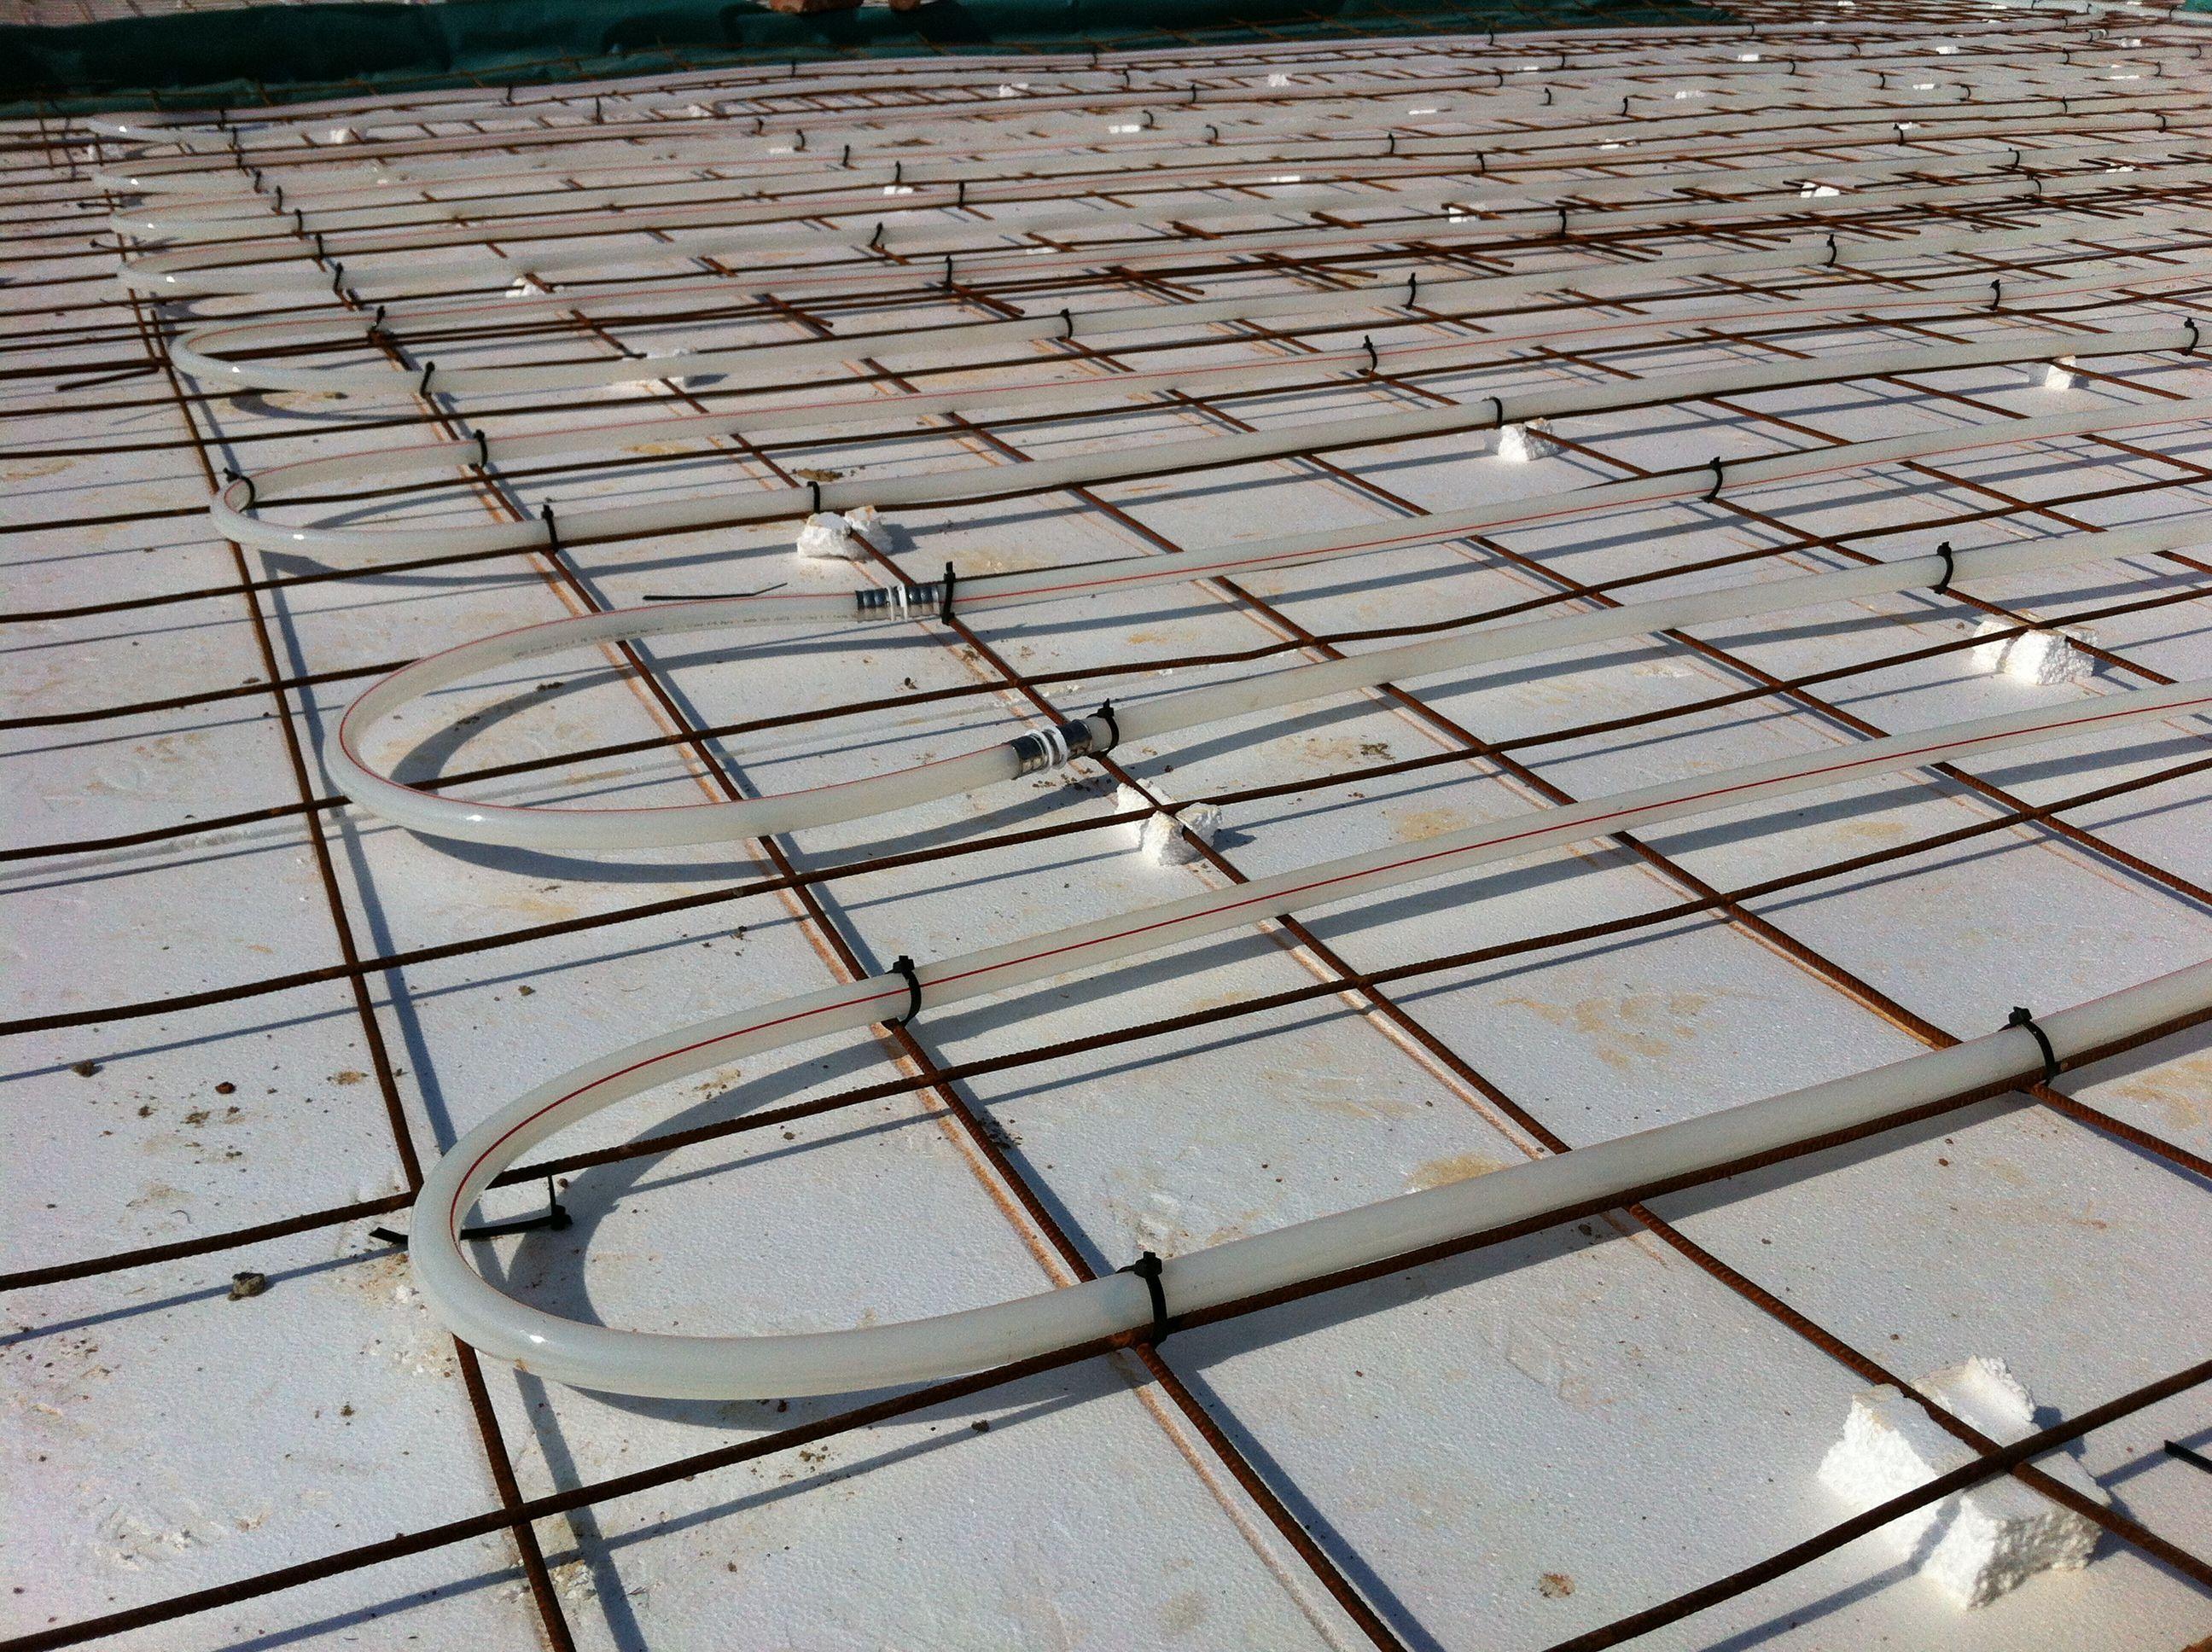 we added eco friendly underfloor heating hot water  [ 2592 x 1936 Pixel ]